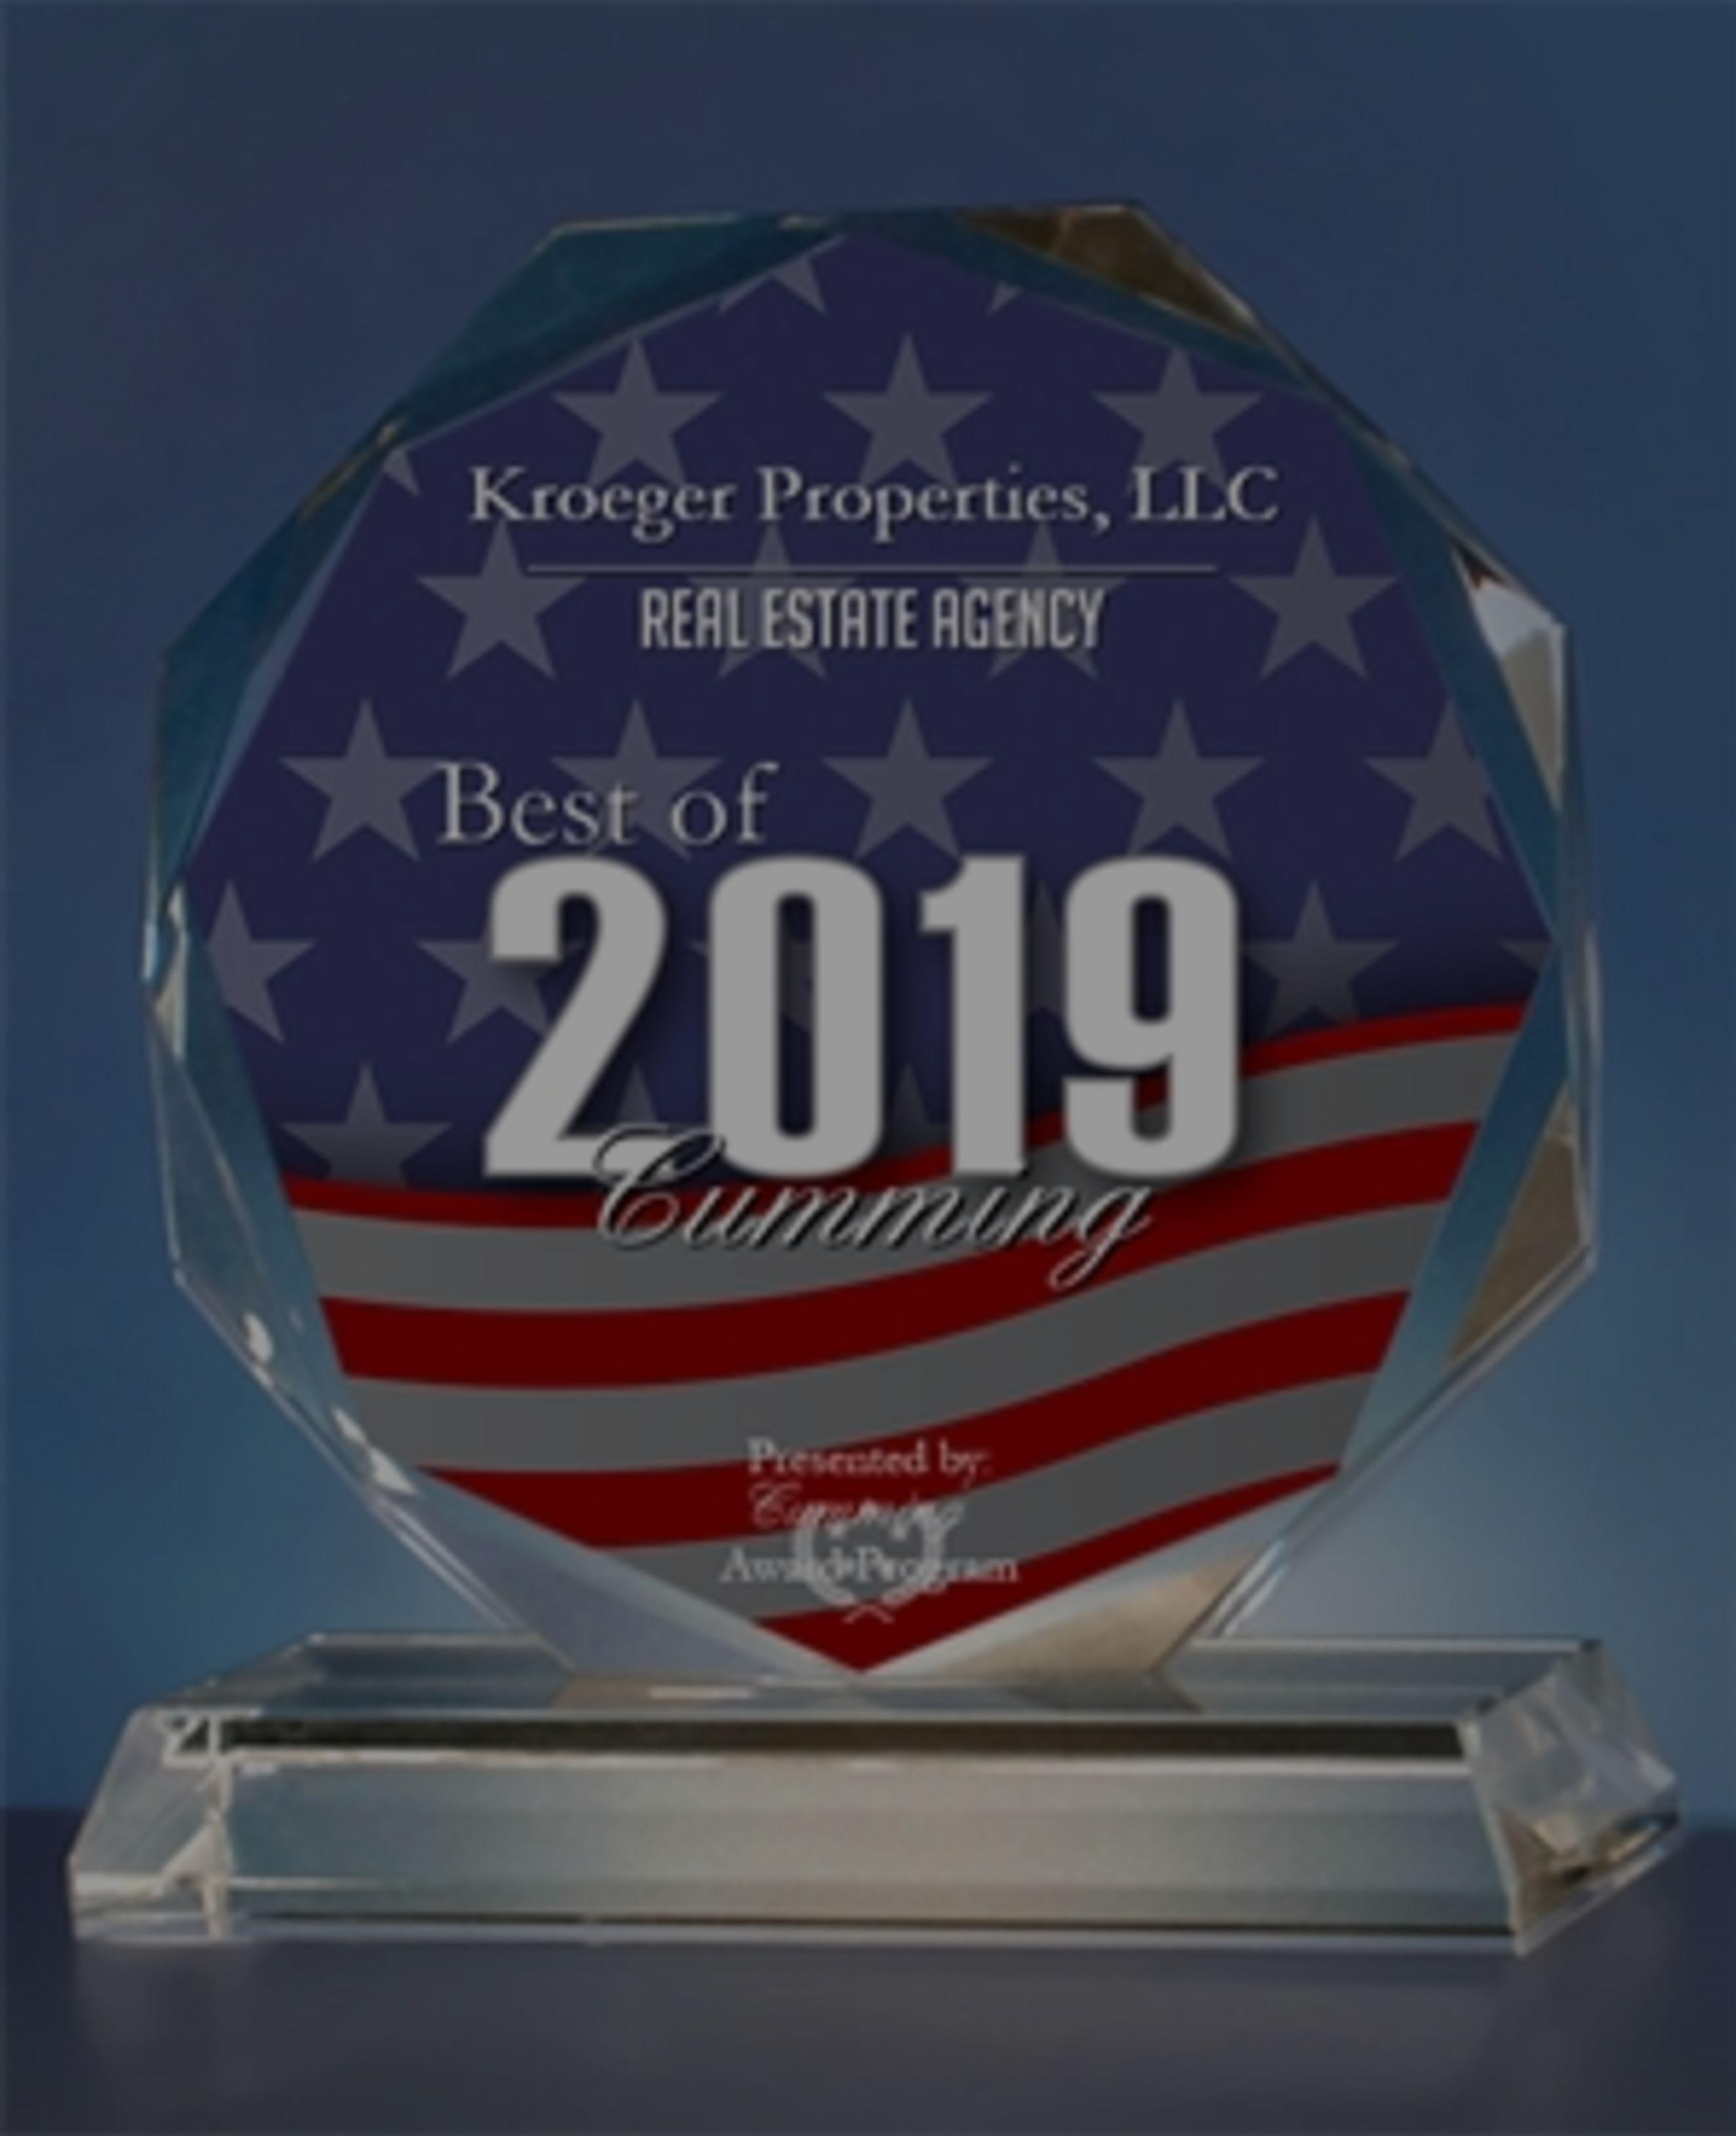 Kroeger Properties, LLC Receives 2019 Best of Cumming Award